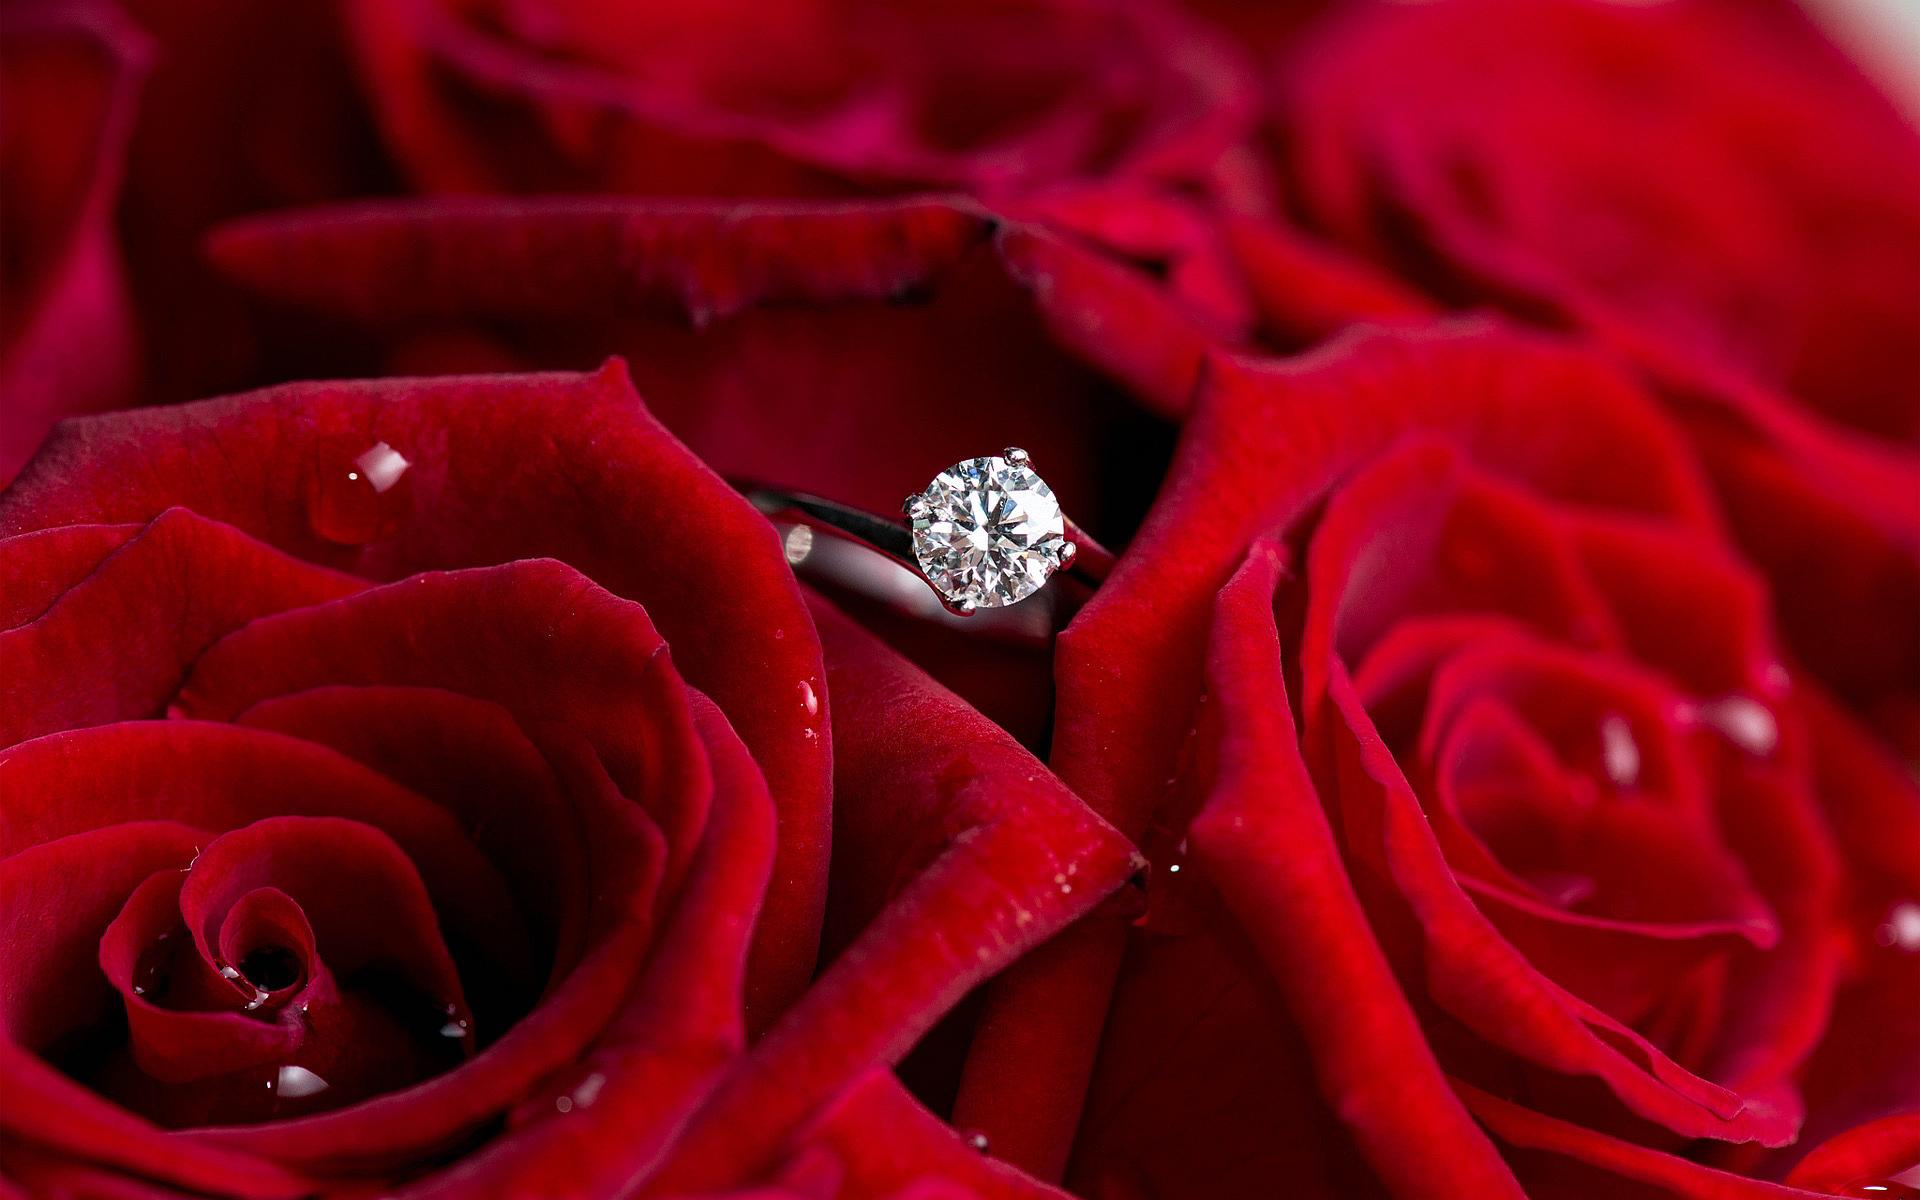 Diamond ring red roses